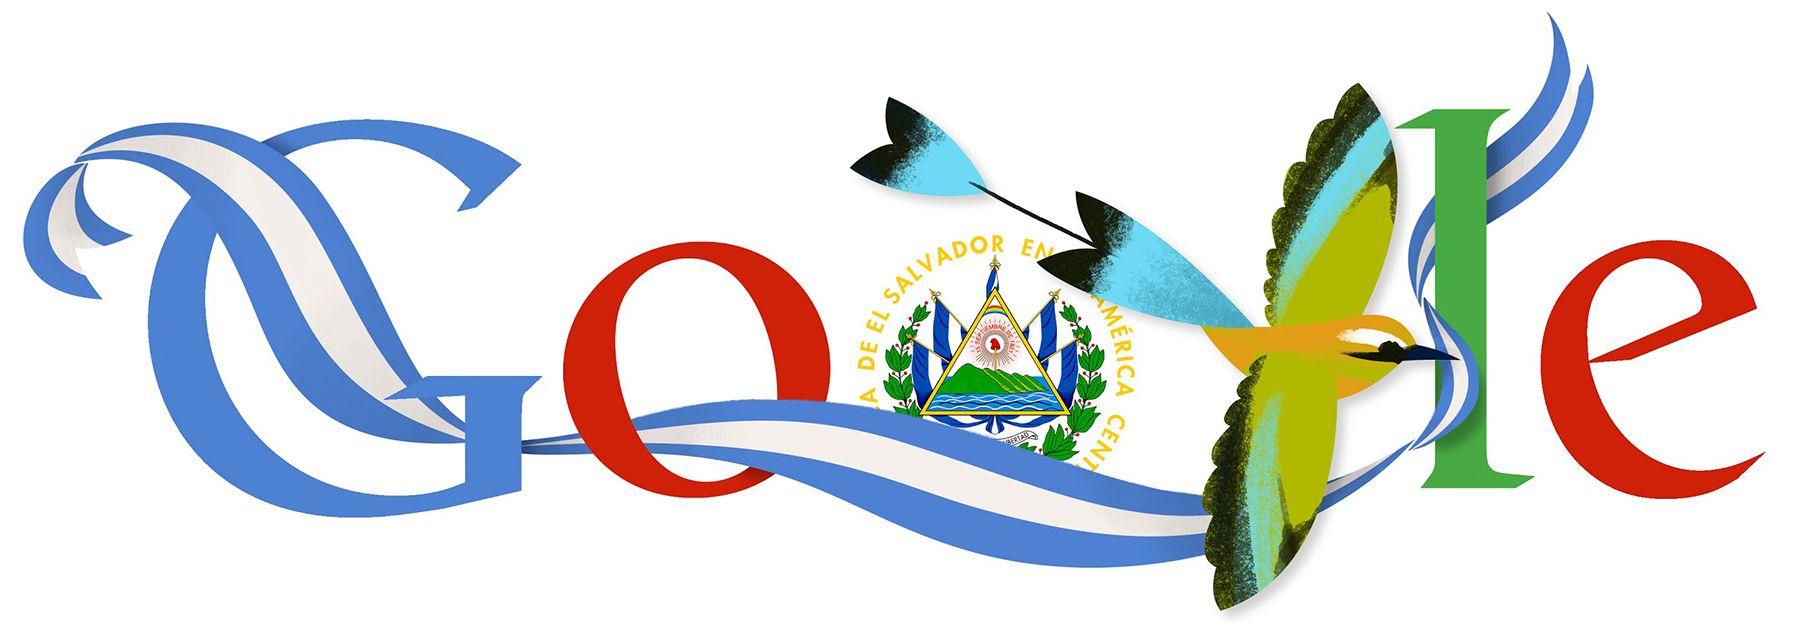 El Salvador Independence Day [День независимости Сальвадора] /This doodle was shown: 15.09.2013 /Countries, in which doodle was shown: El Salvador